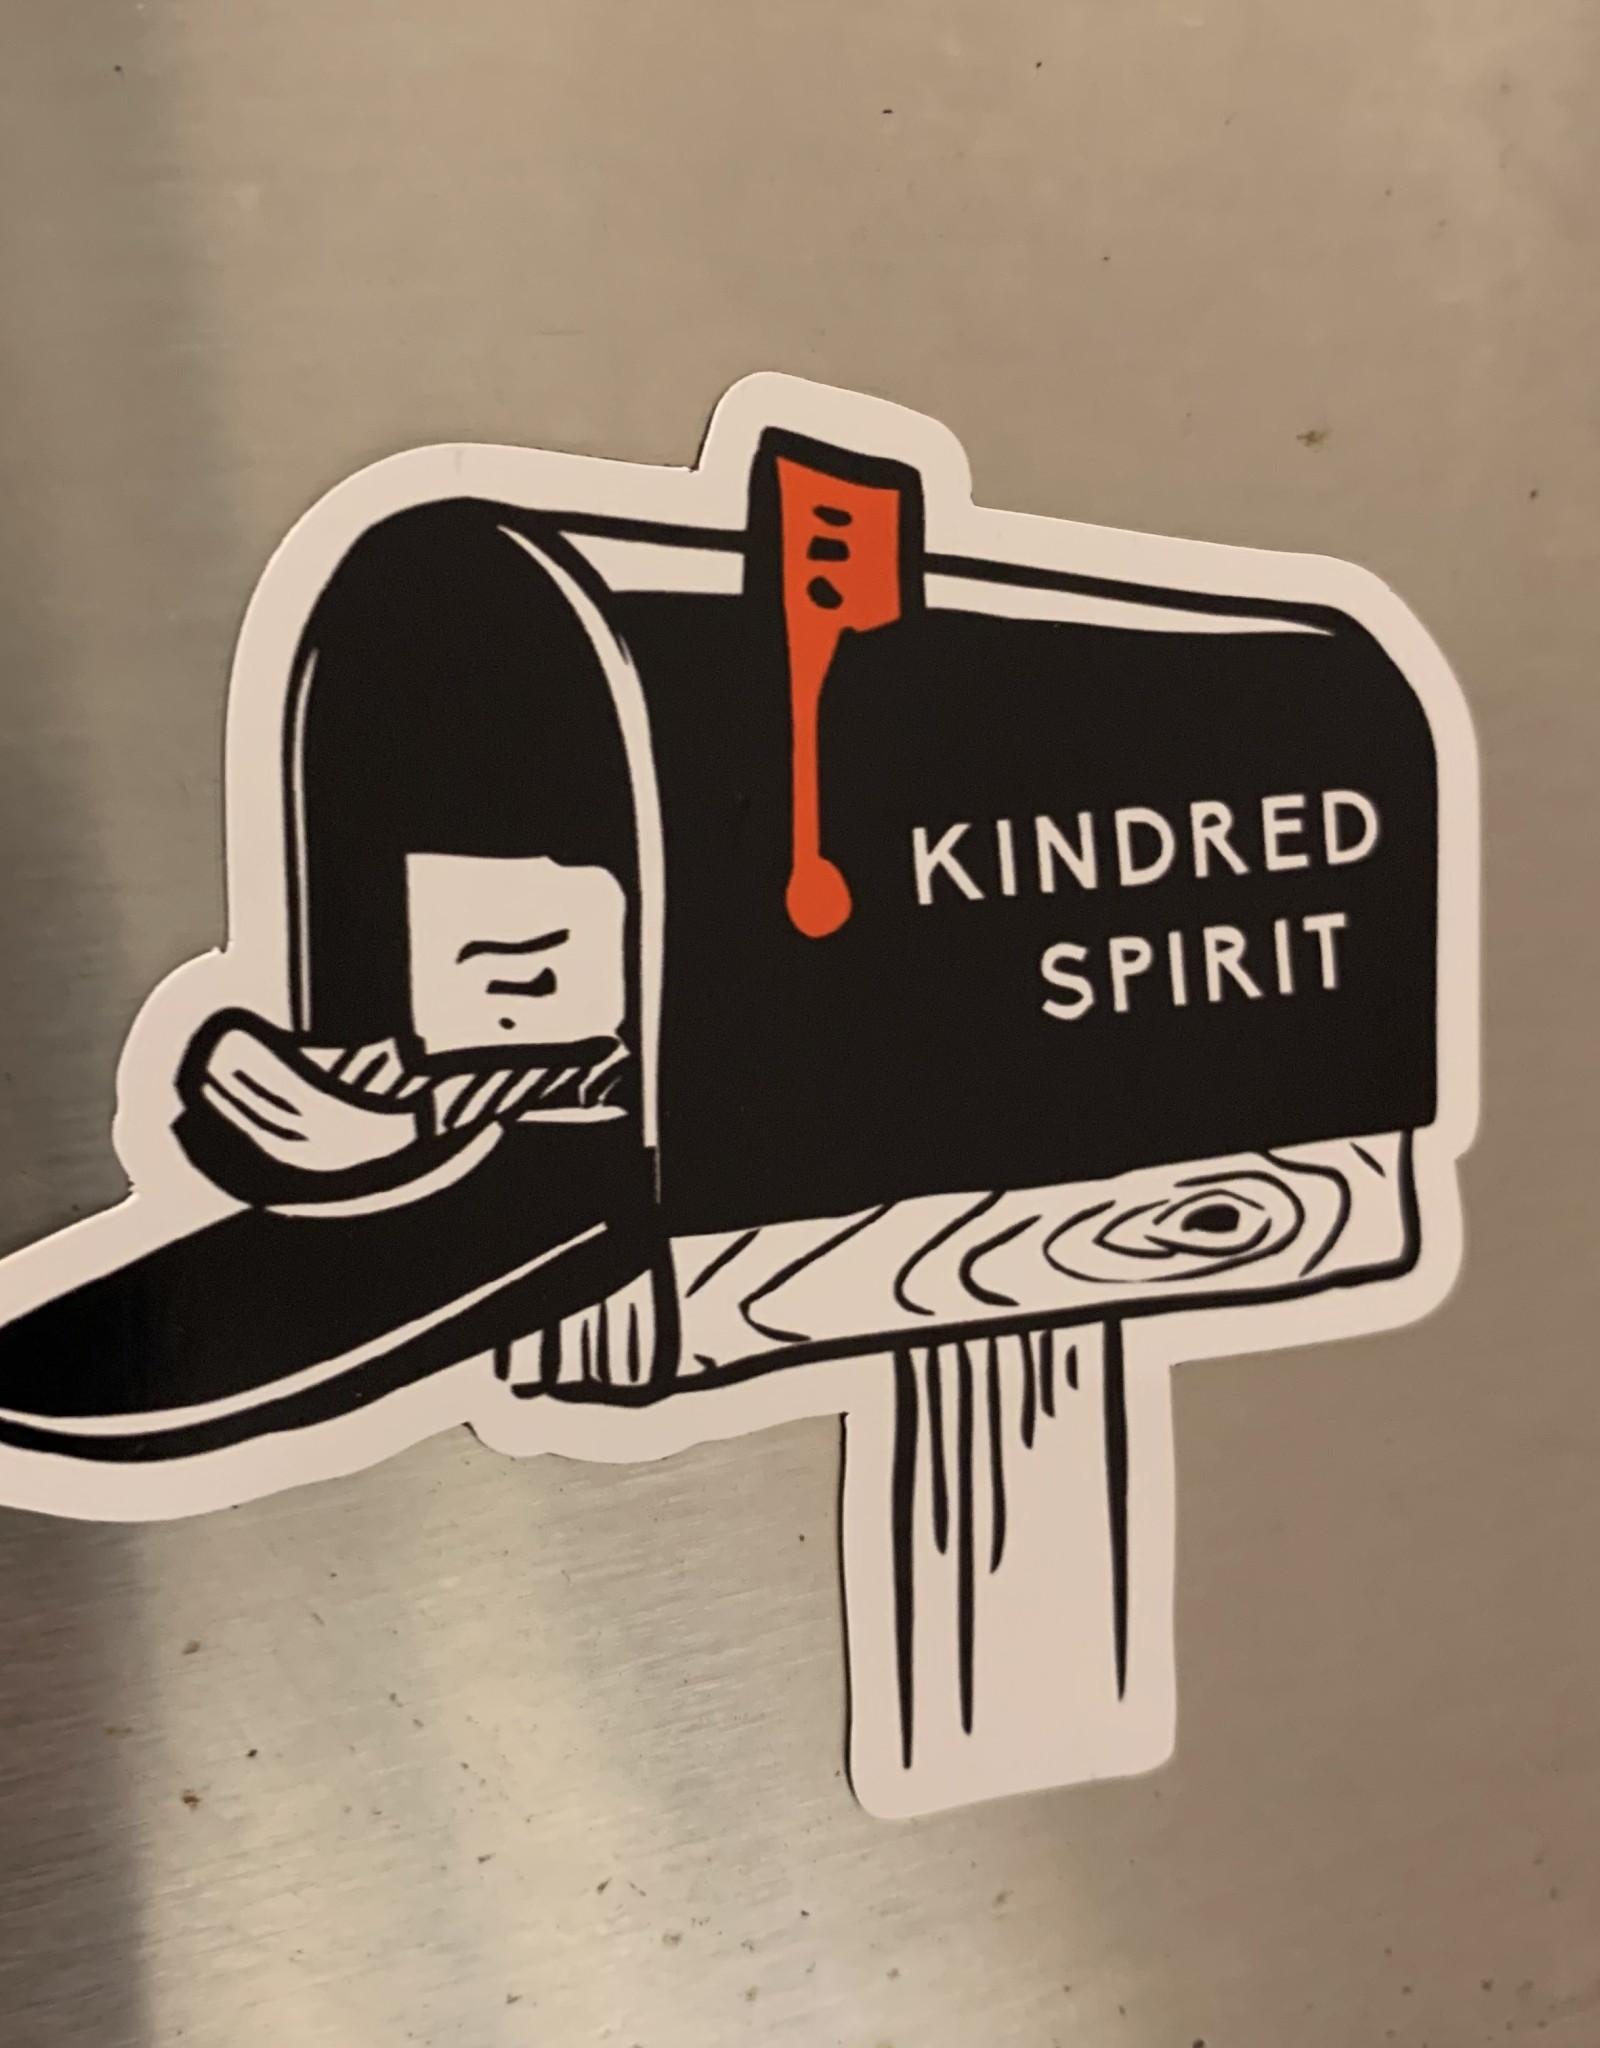 KINDRED SPIRIT KINDRED SPIRIT CAR MAGNET